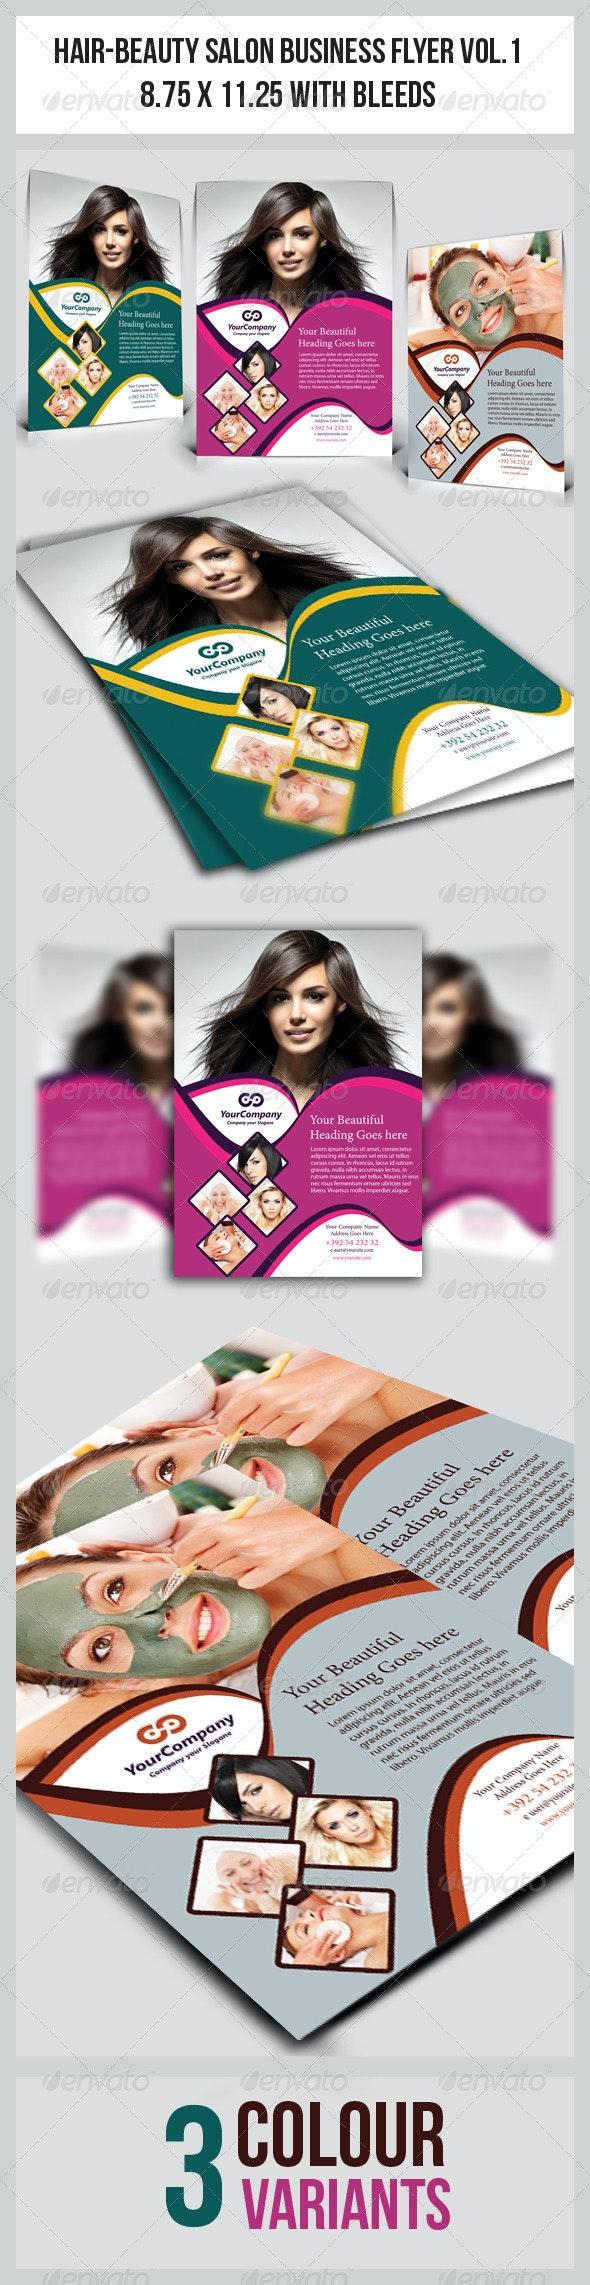 Hair & Beauty Salon Business  Flyer Vol.1 - Corporate Flyers